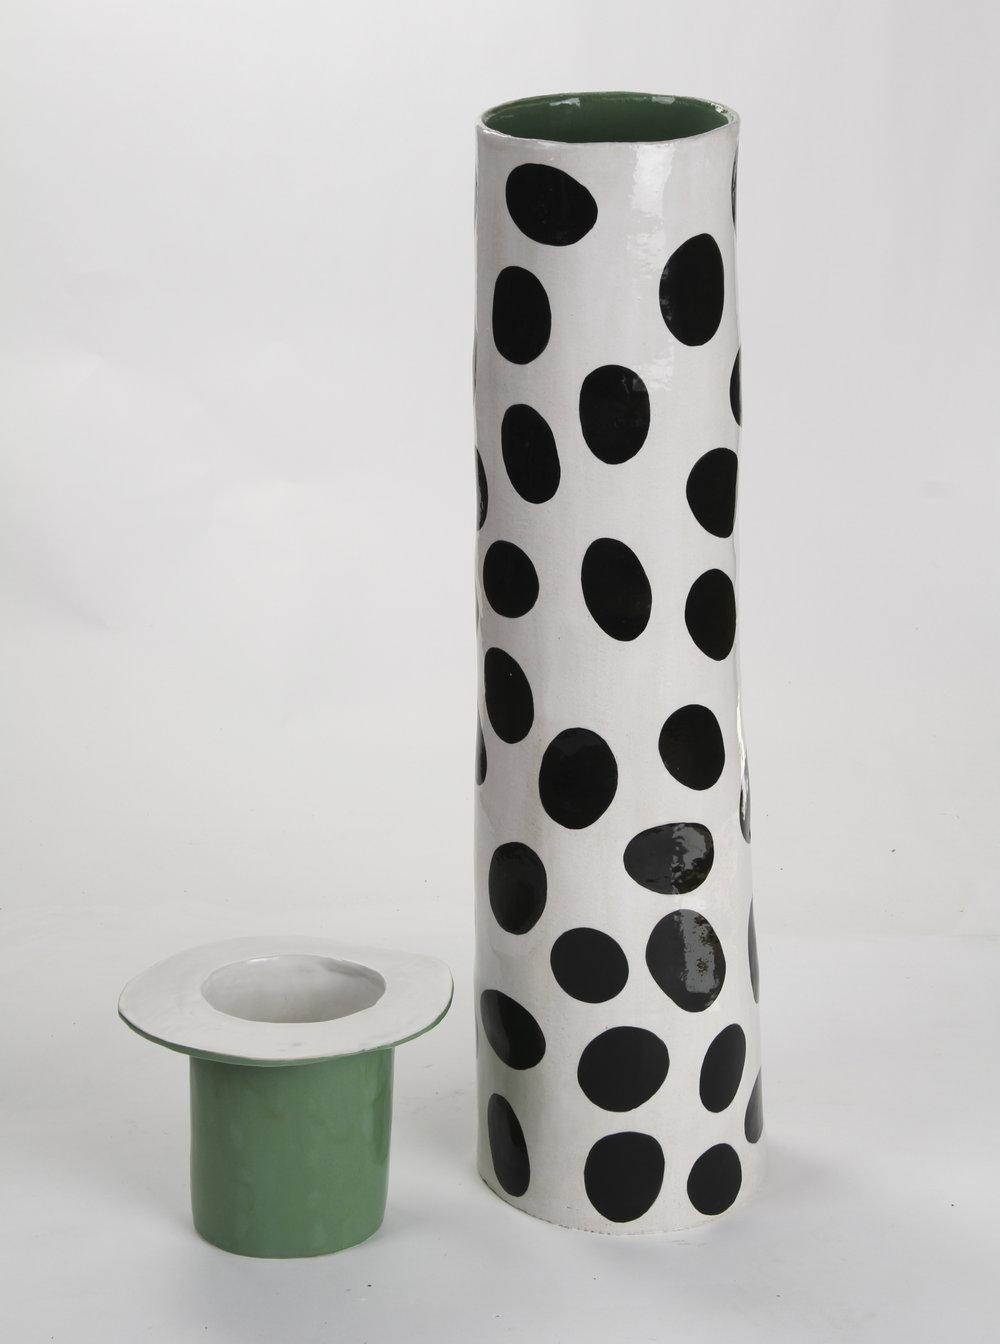 dalmation vase 2.jpg